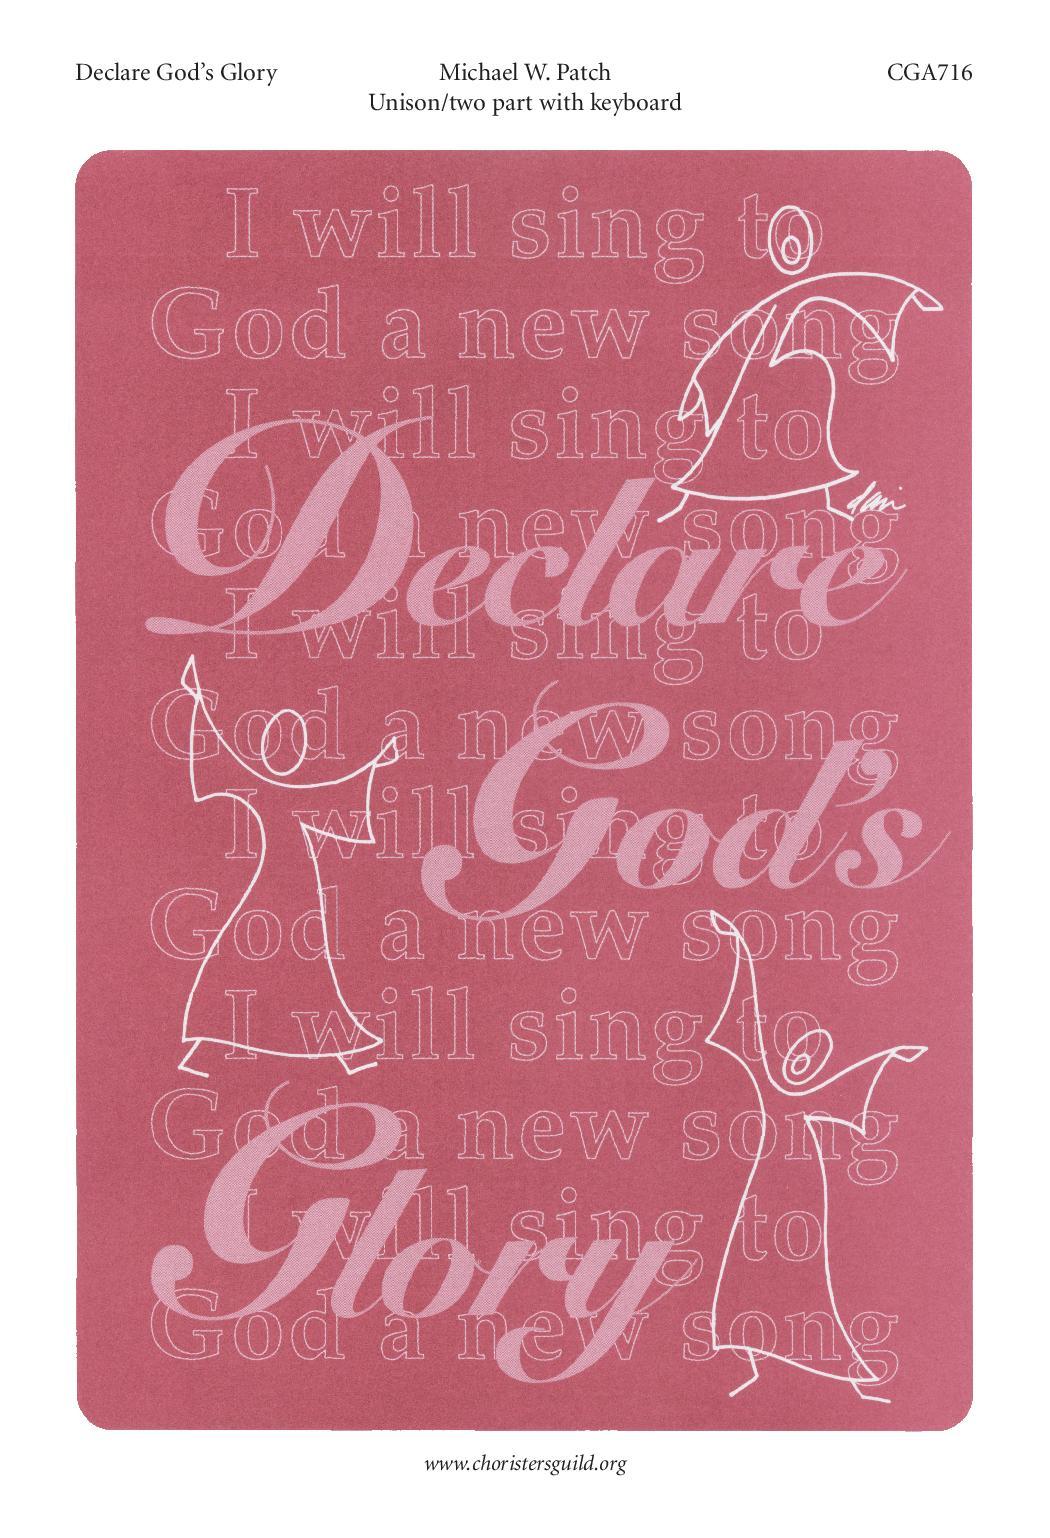 Declare God's Glory